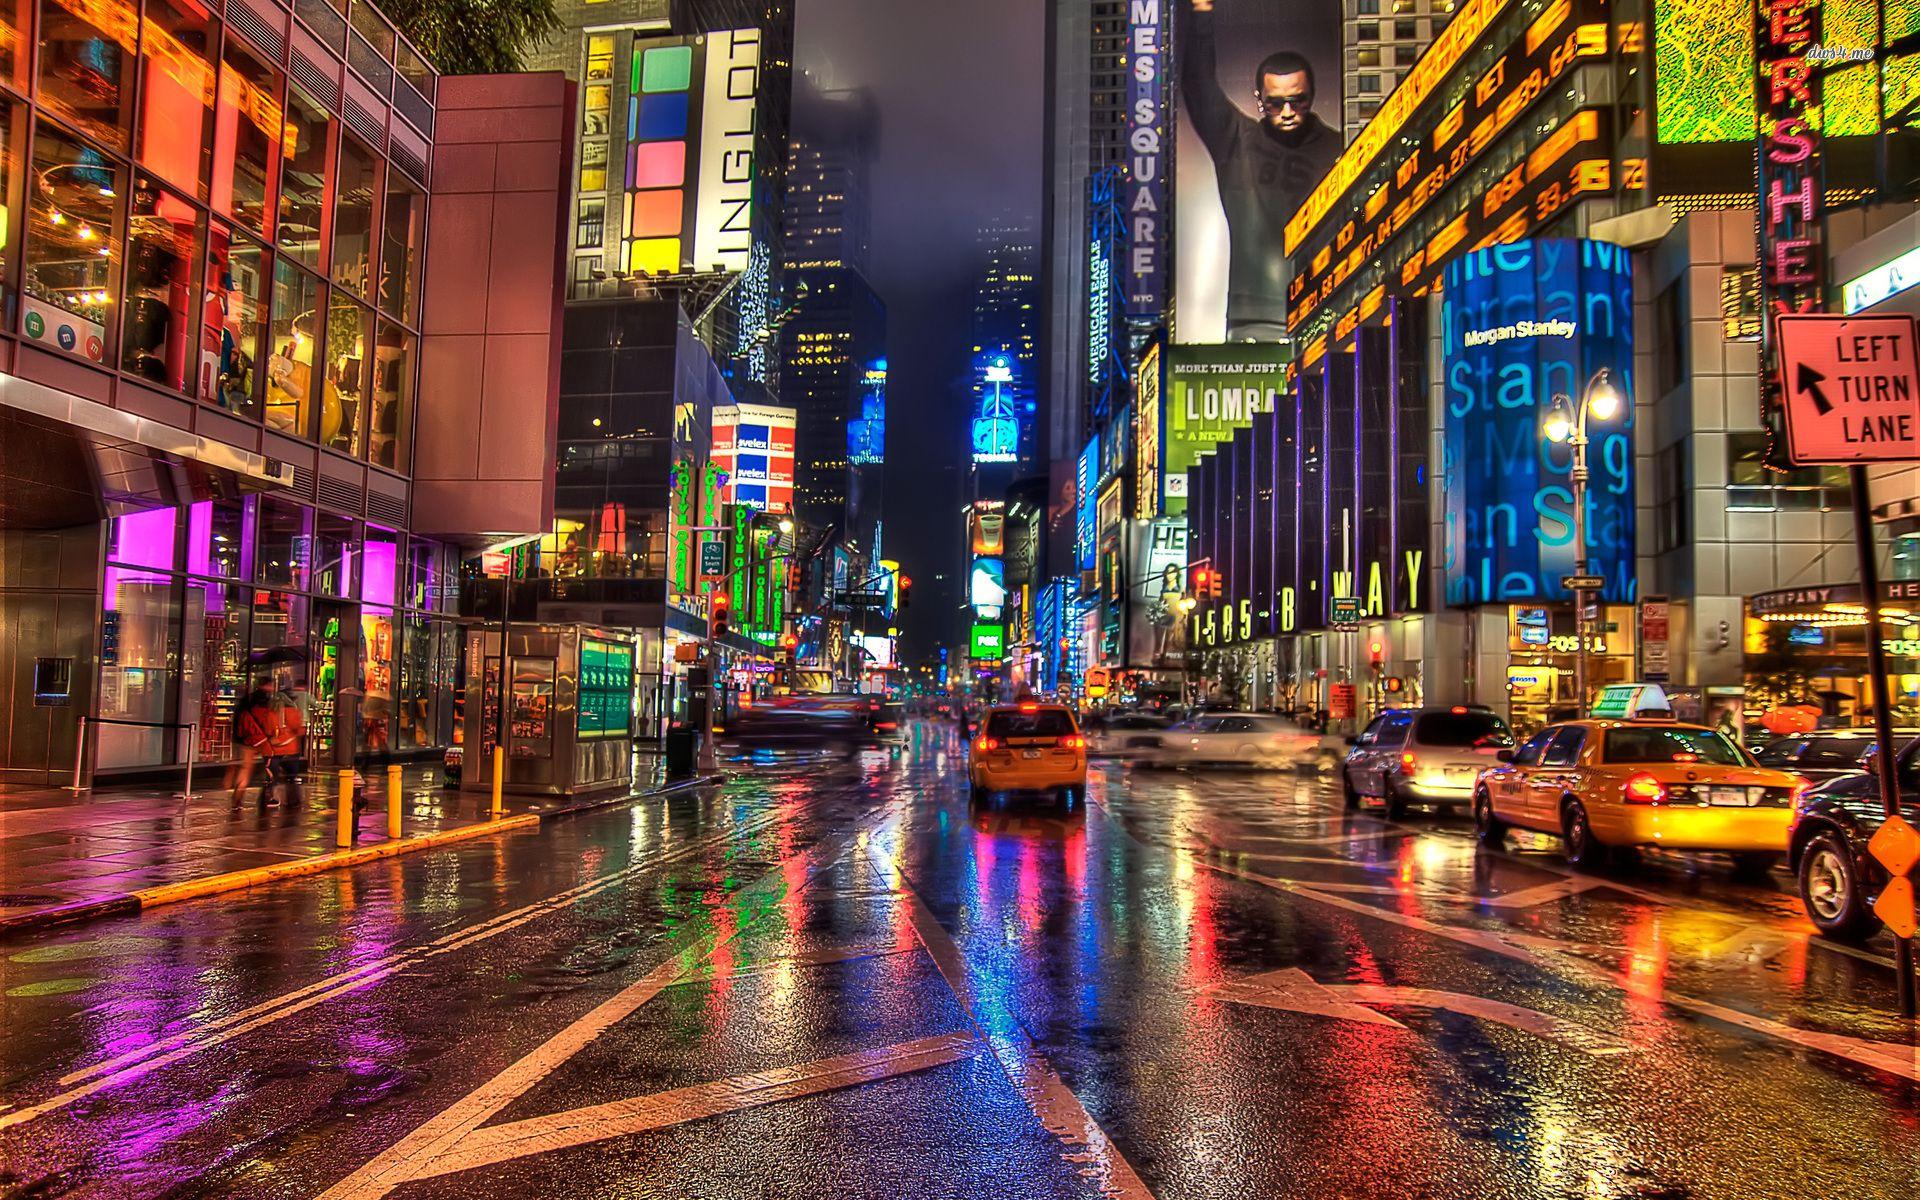 Http Kindawarped Com Wp Content Uploads New York City Street World Hd Wallpaper 89361 Jpg Times Square New York City Manzara